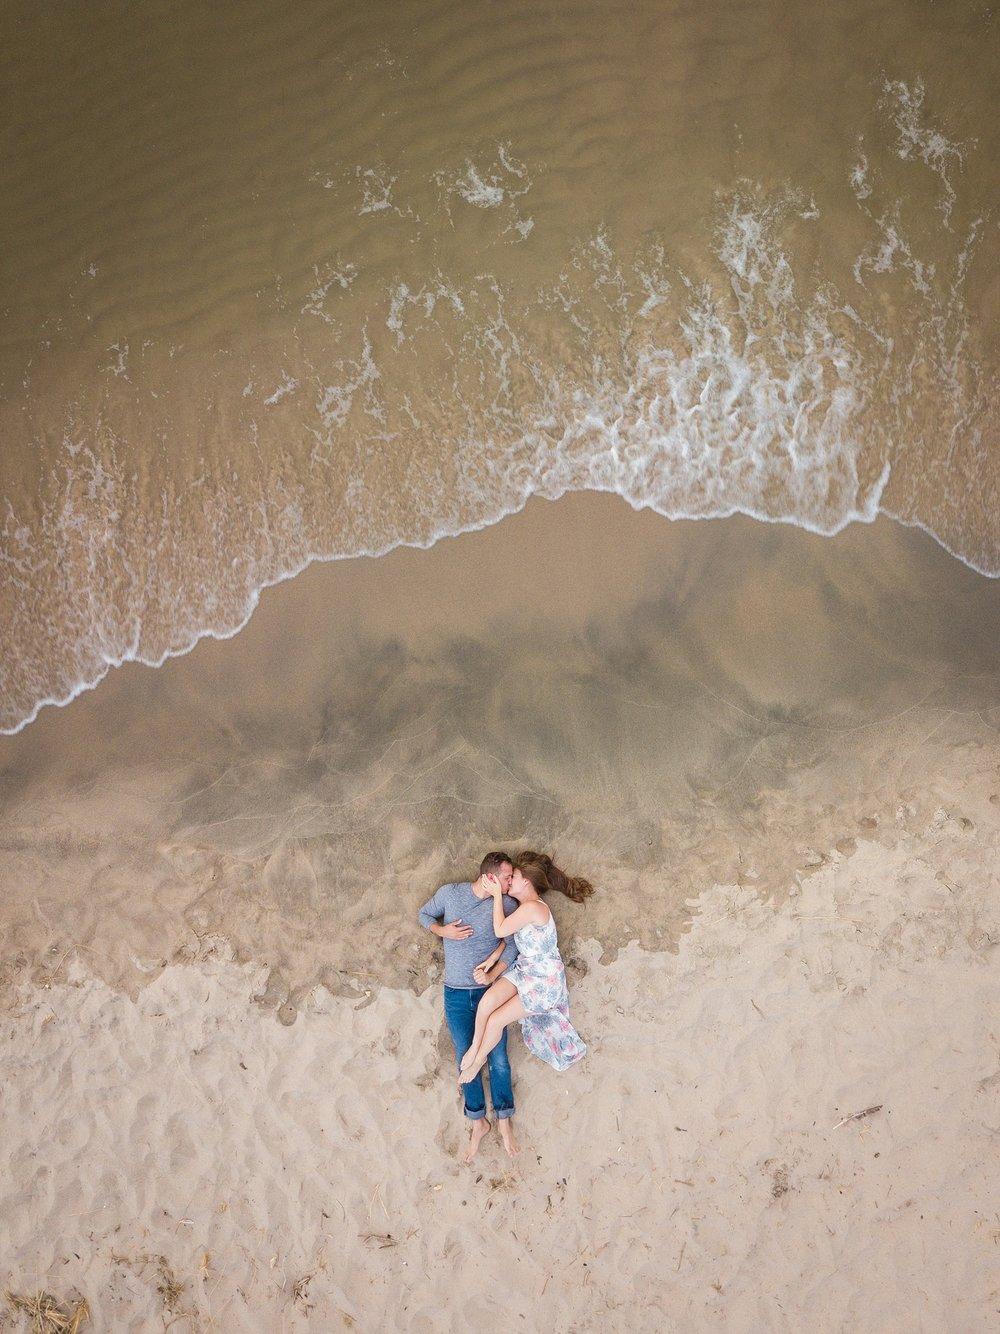 Lila_Ryan_Holland_Lakeshore_Beach_Drone_Engagement_Photos_0014.jpg